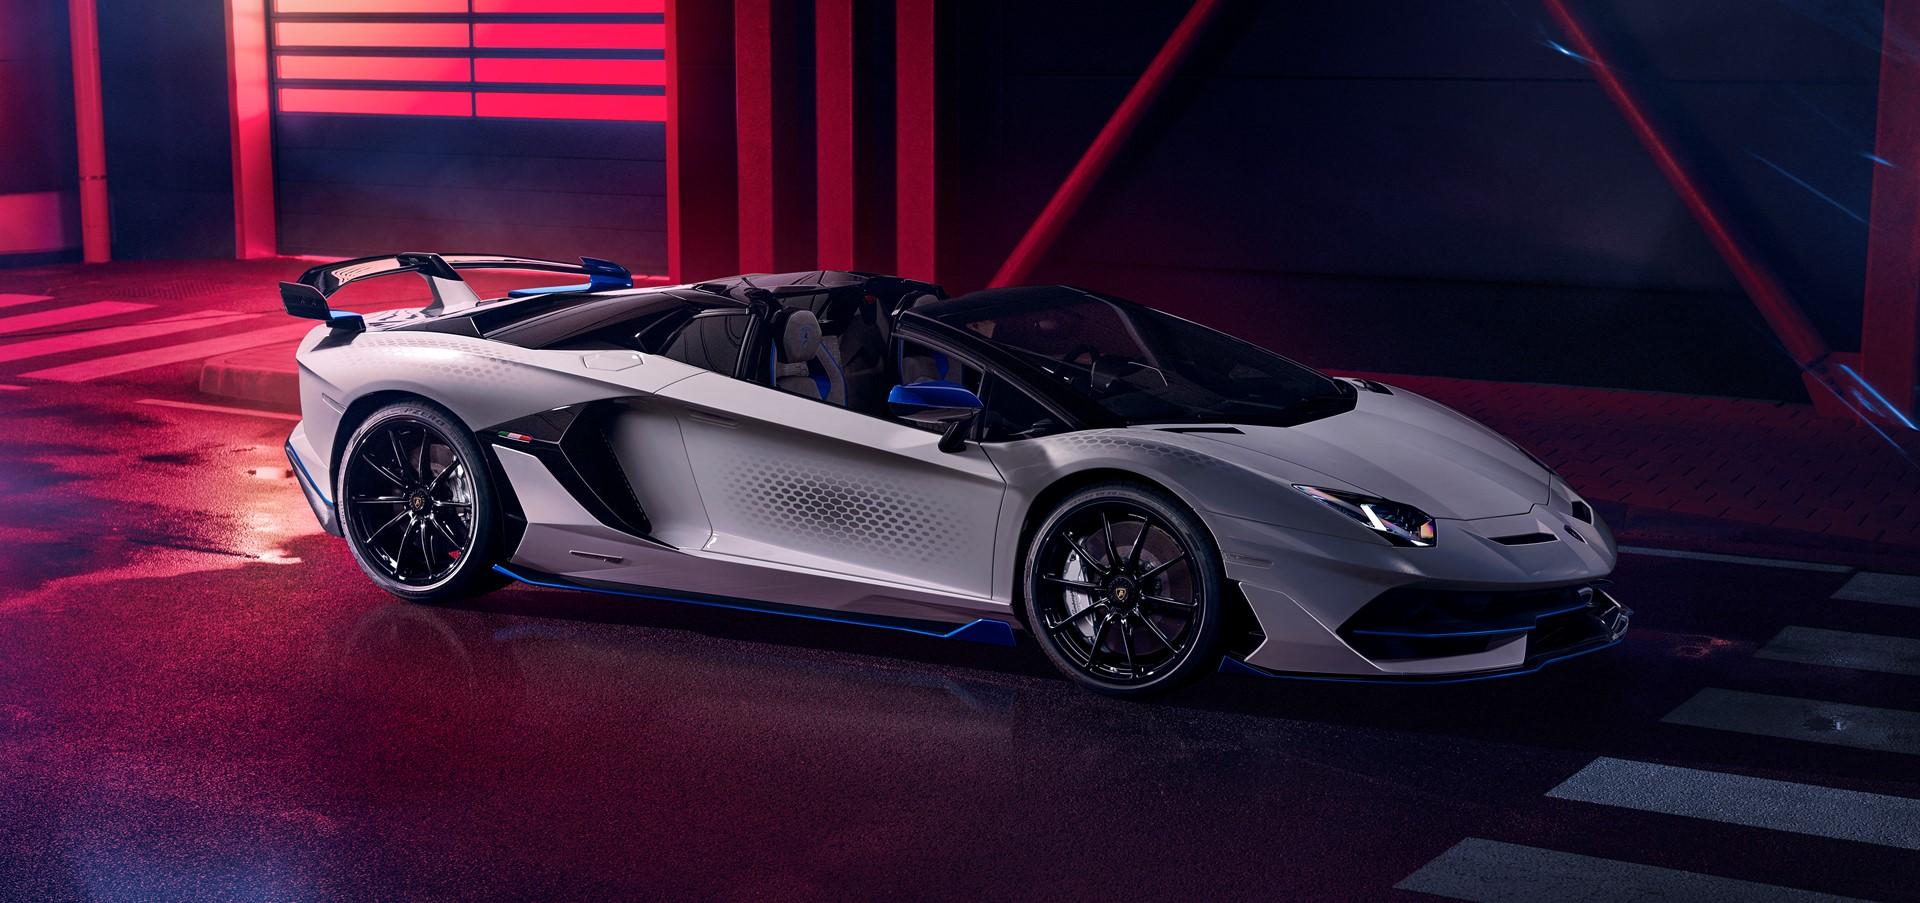 New Lamborghini Ad Personam virtual studio